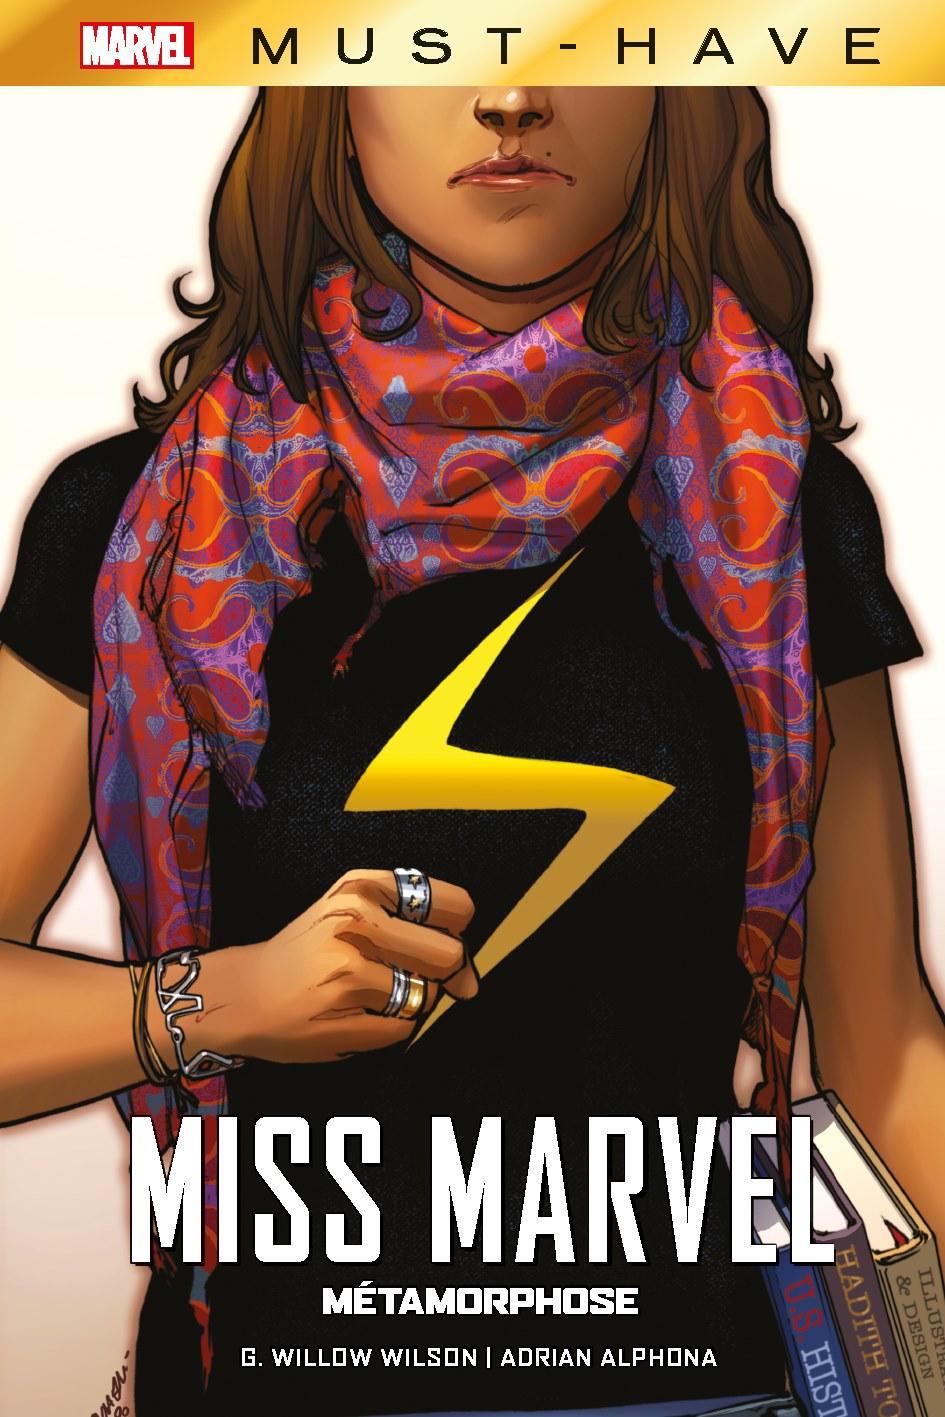 MISS MARVEL : MÉTAMORPHOSE (MUST-HAVE)